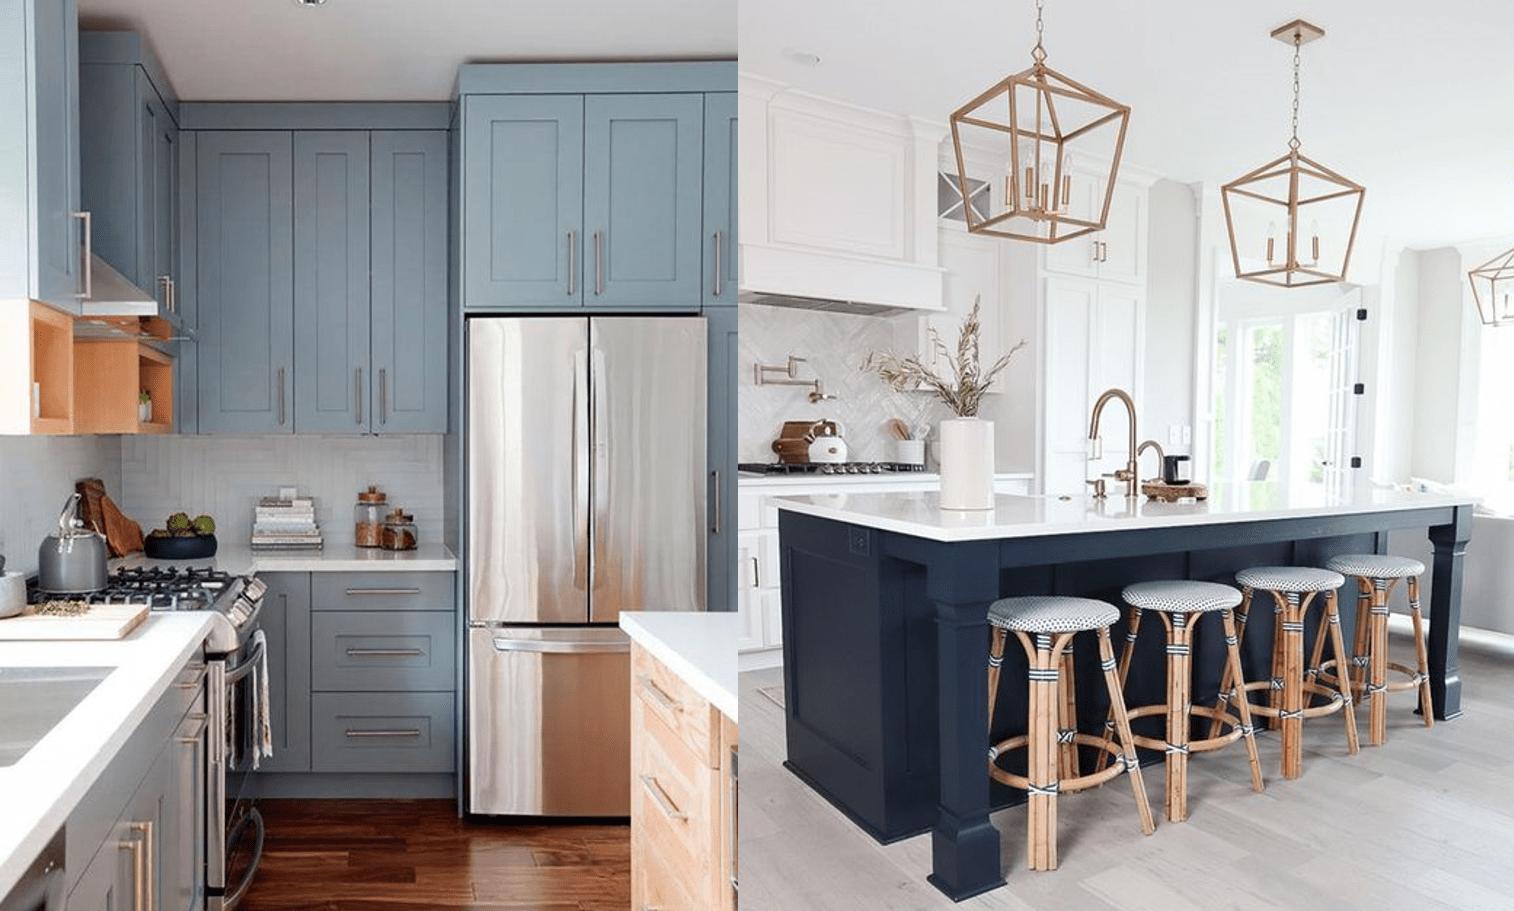 The latest kitchen designs for 2021 – Trend kitchen design